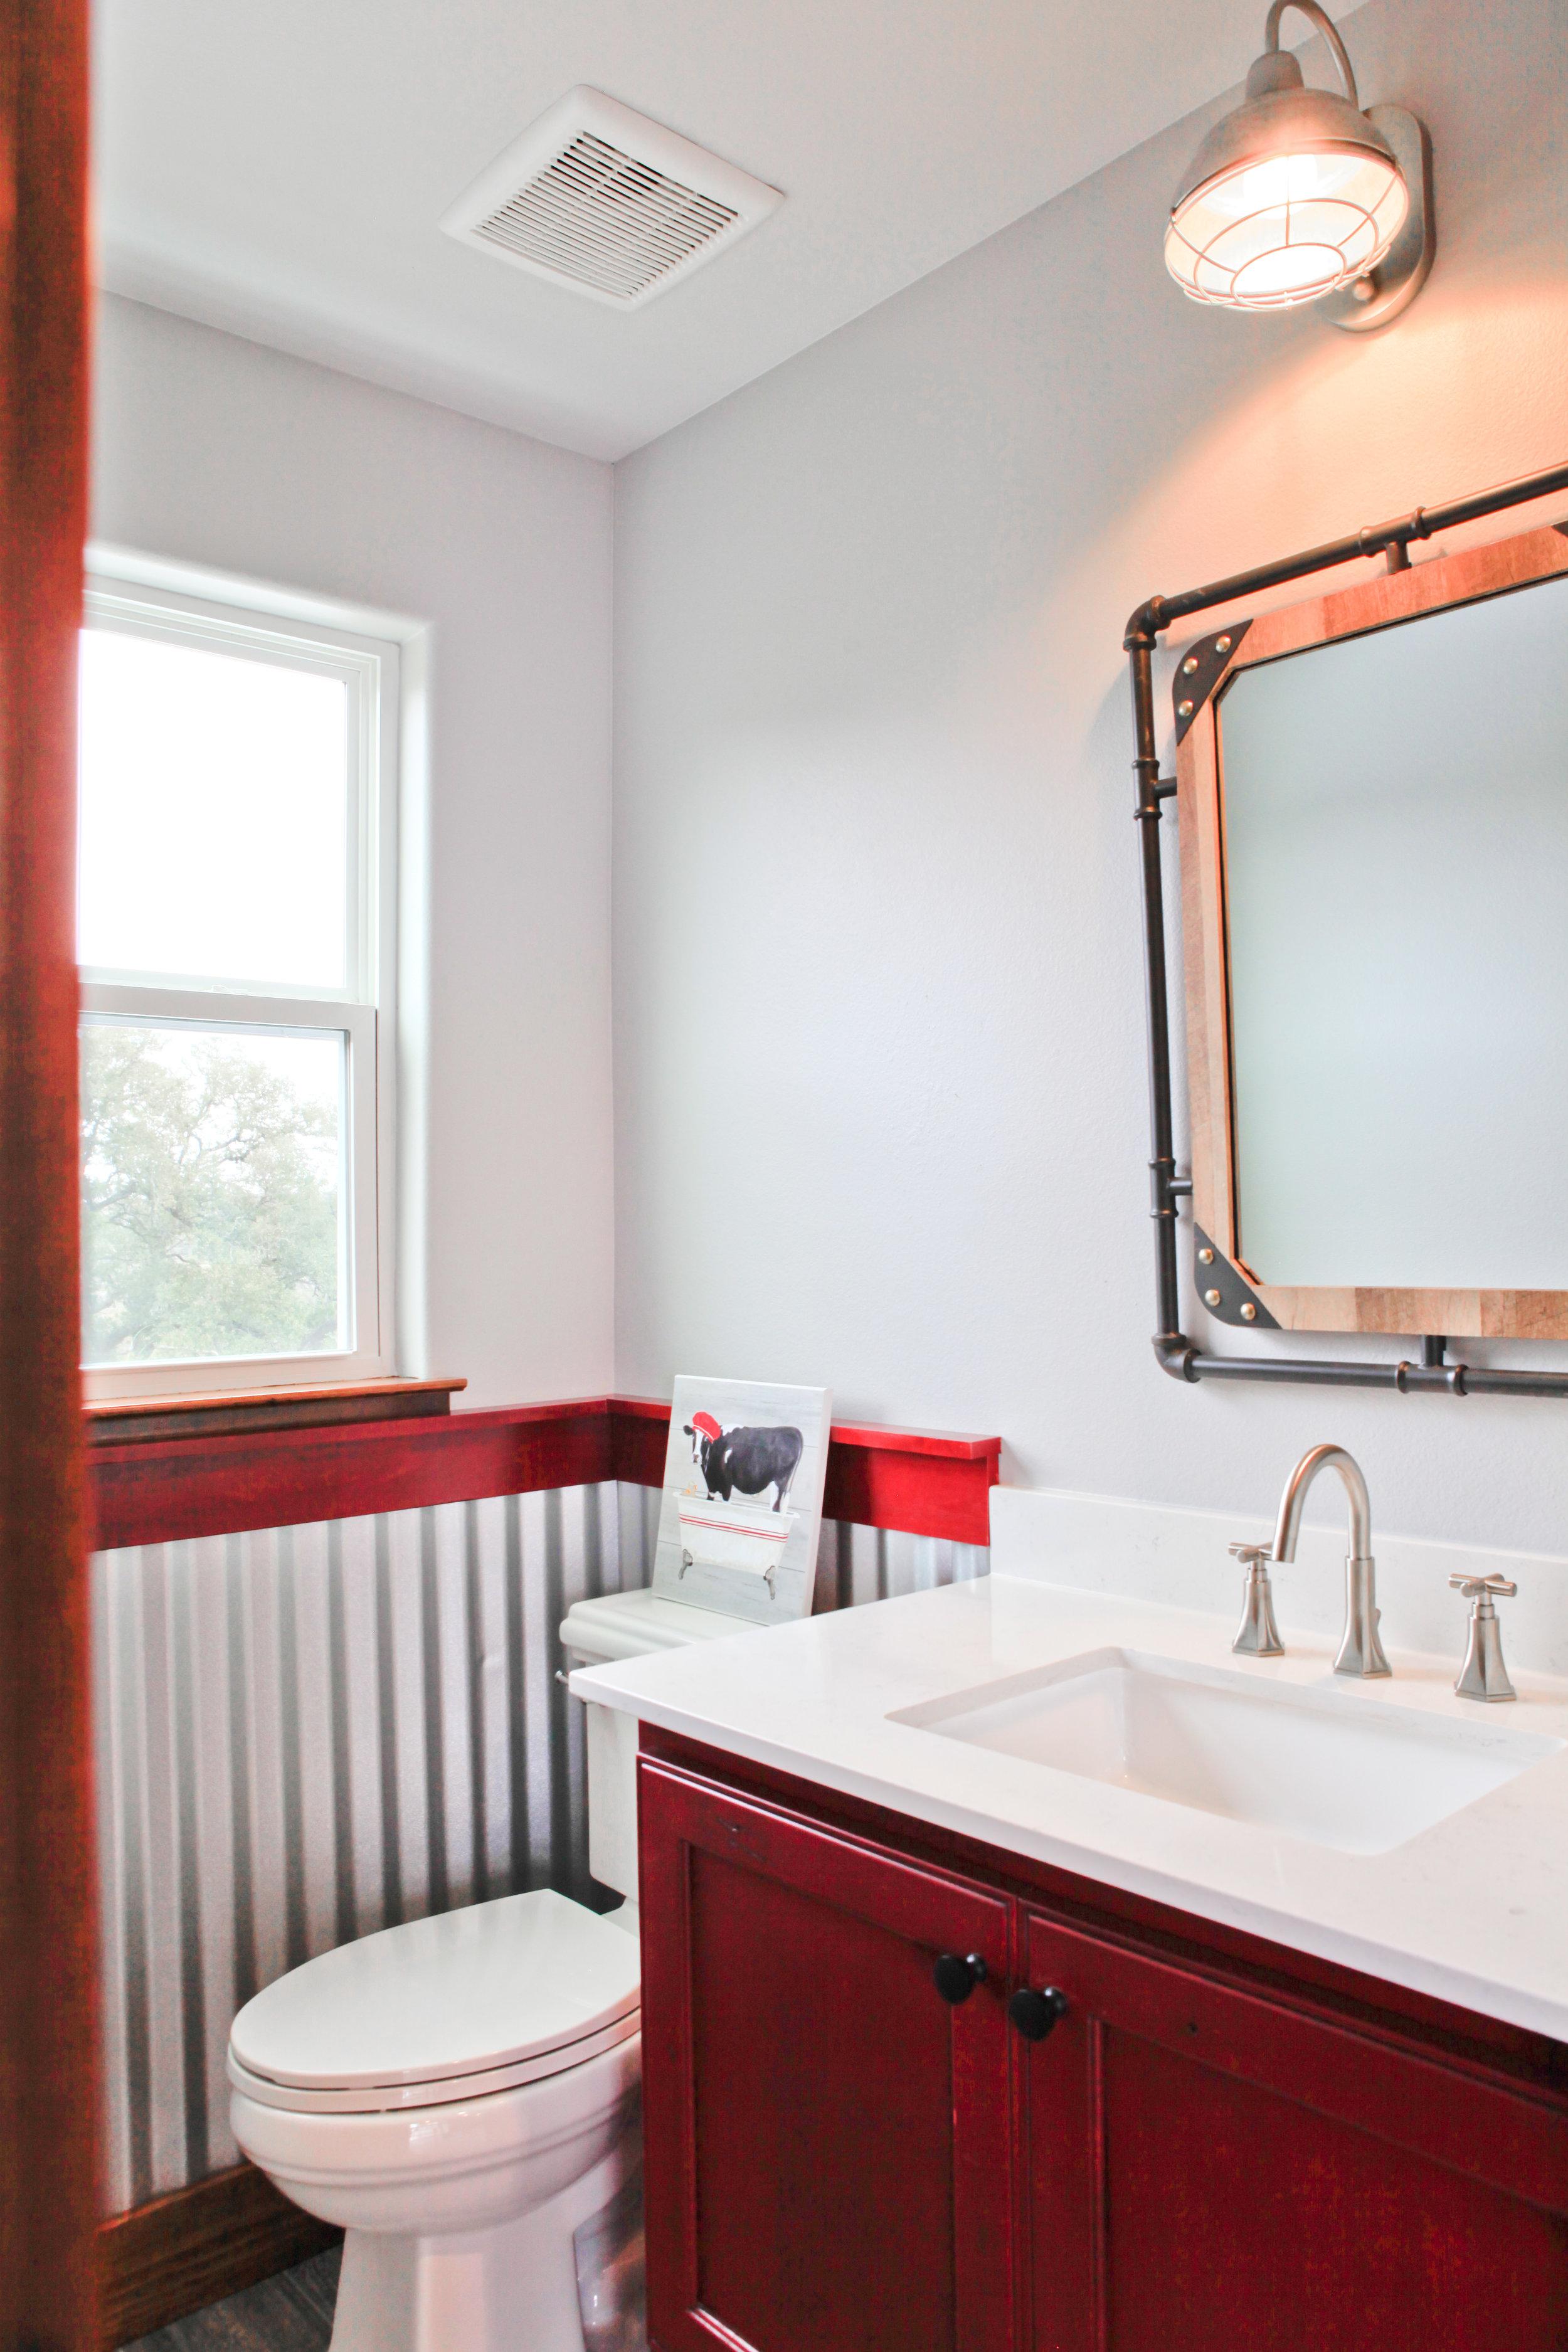 Guest House - Bathroom 2.jpg